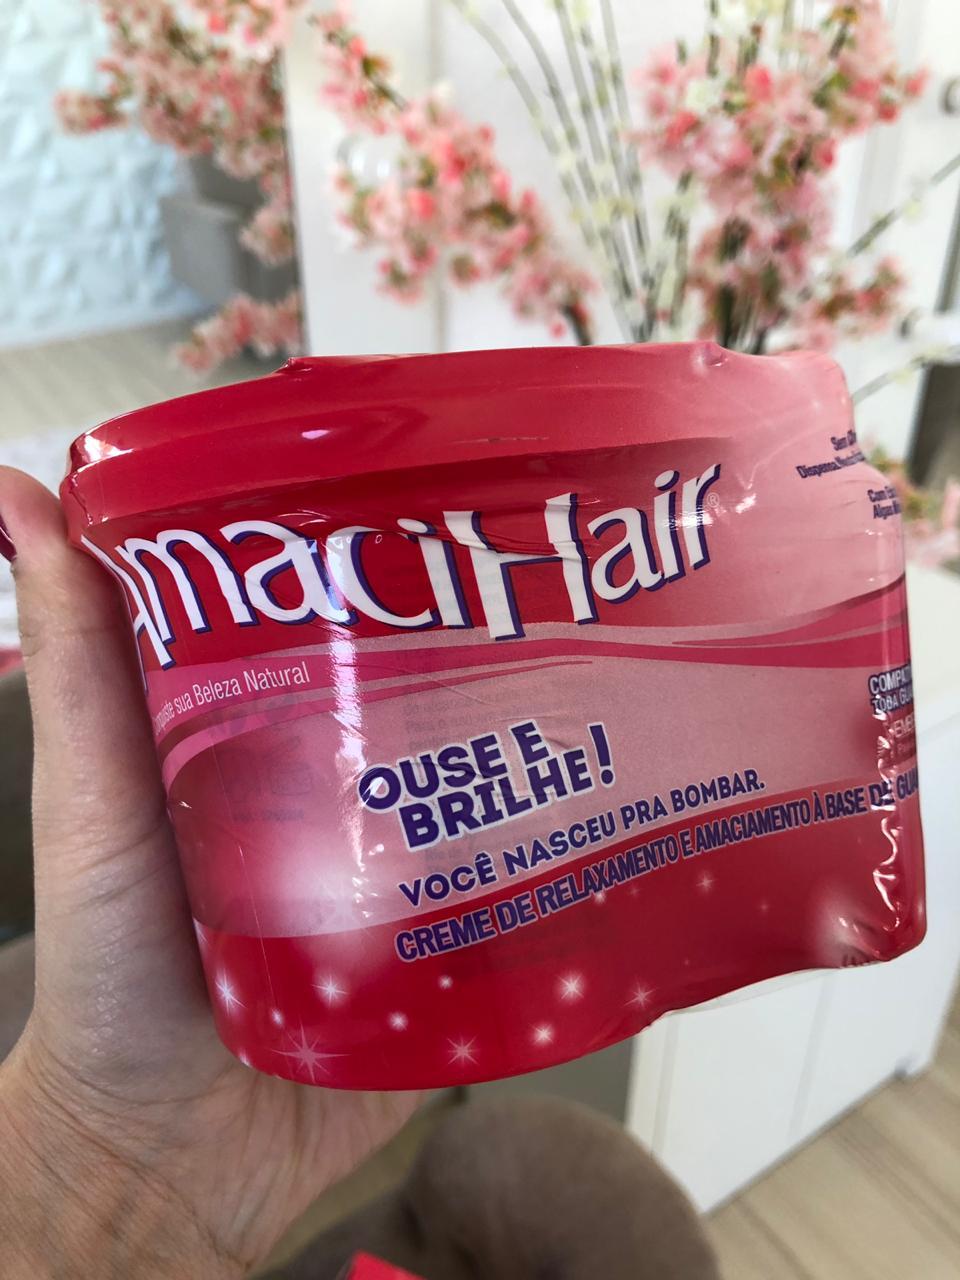 como-relaxar-o-cabelo-com-creme-relaxante-amacihair-da-embelleze-ouse-e-brilhe-balde